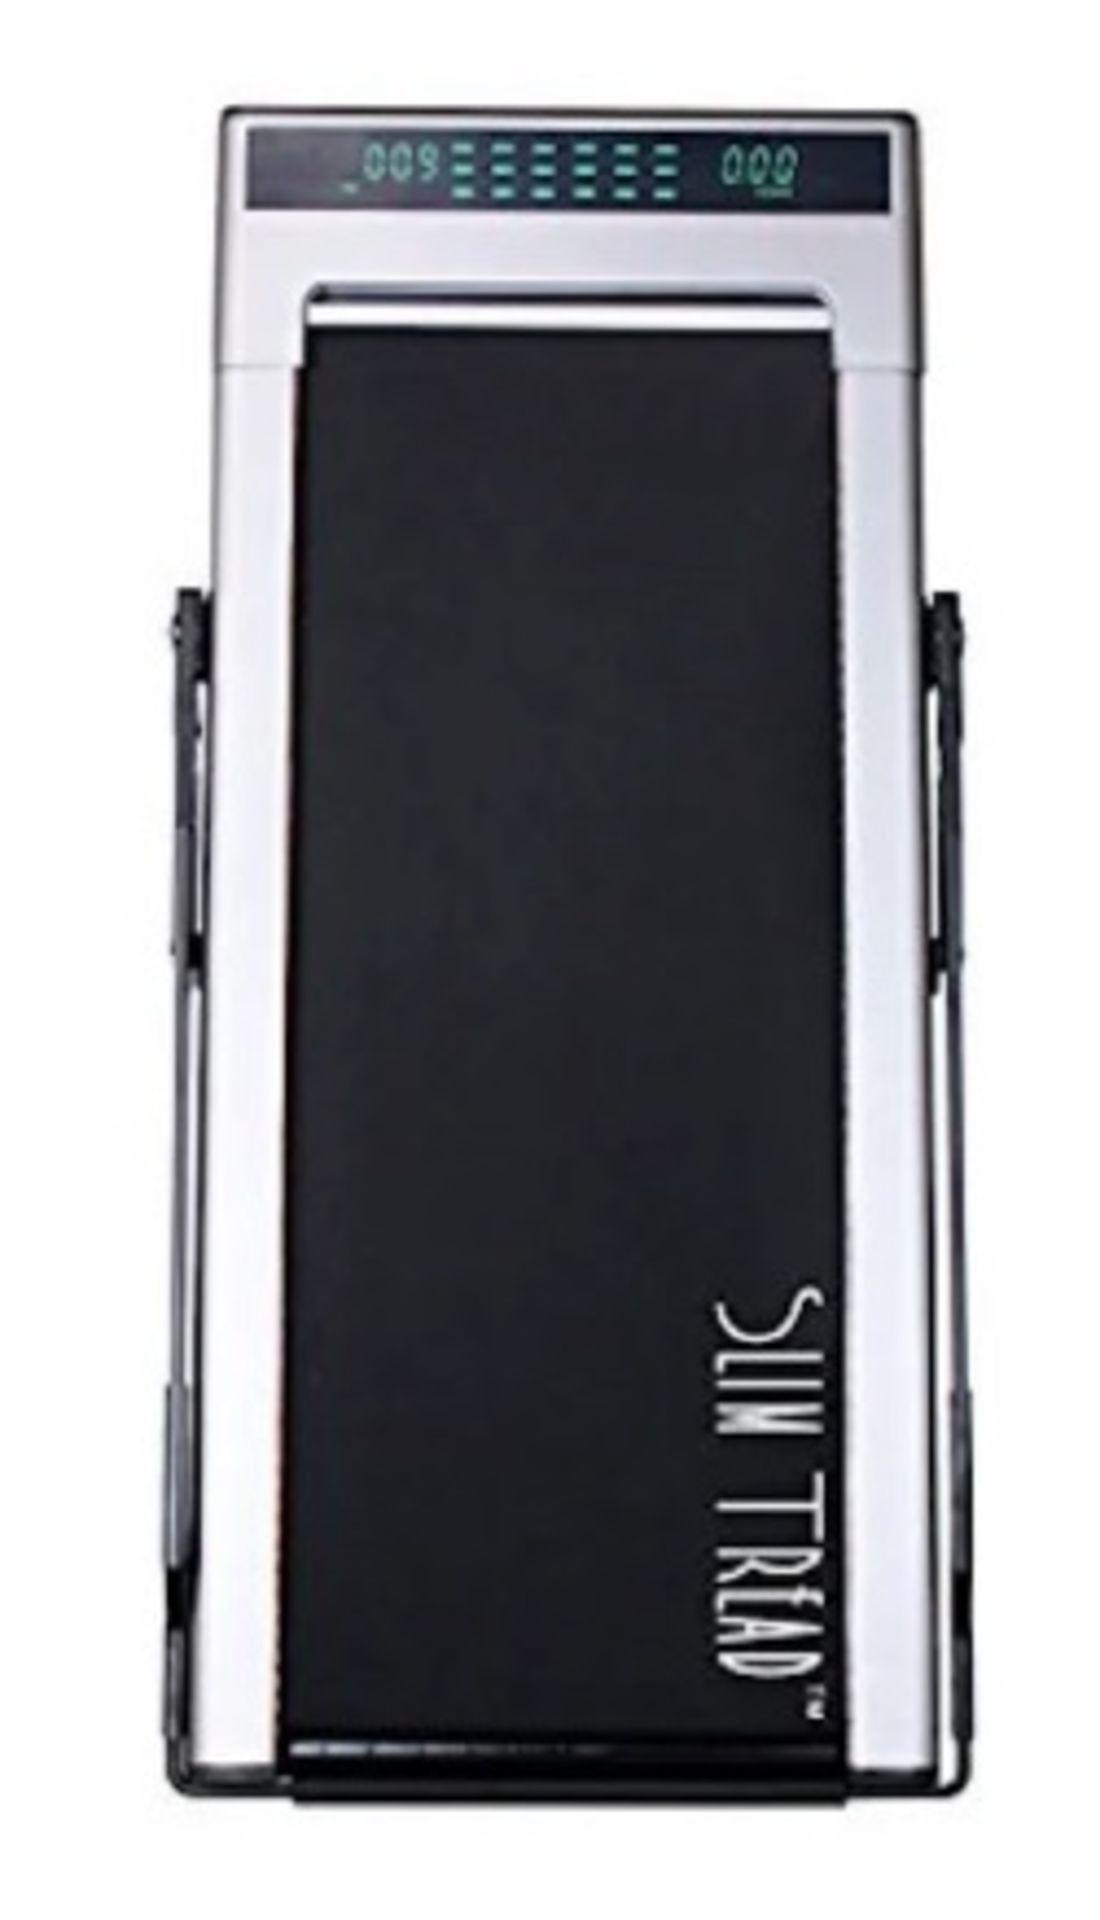 1 x Slim Tread Ultra Thin Smart Treadmill Running / Walking Machine - Lightweight With Folding - Image 3 of 23